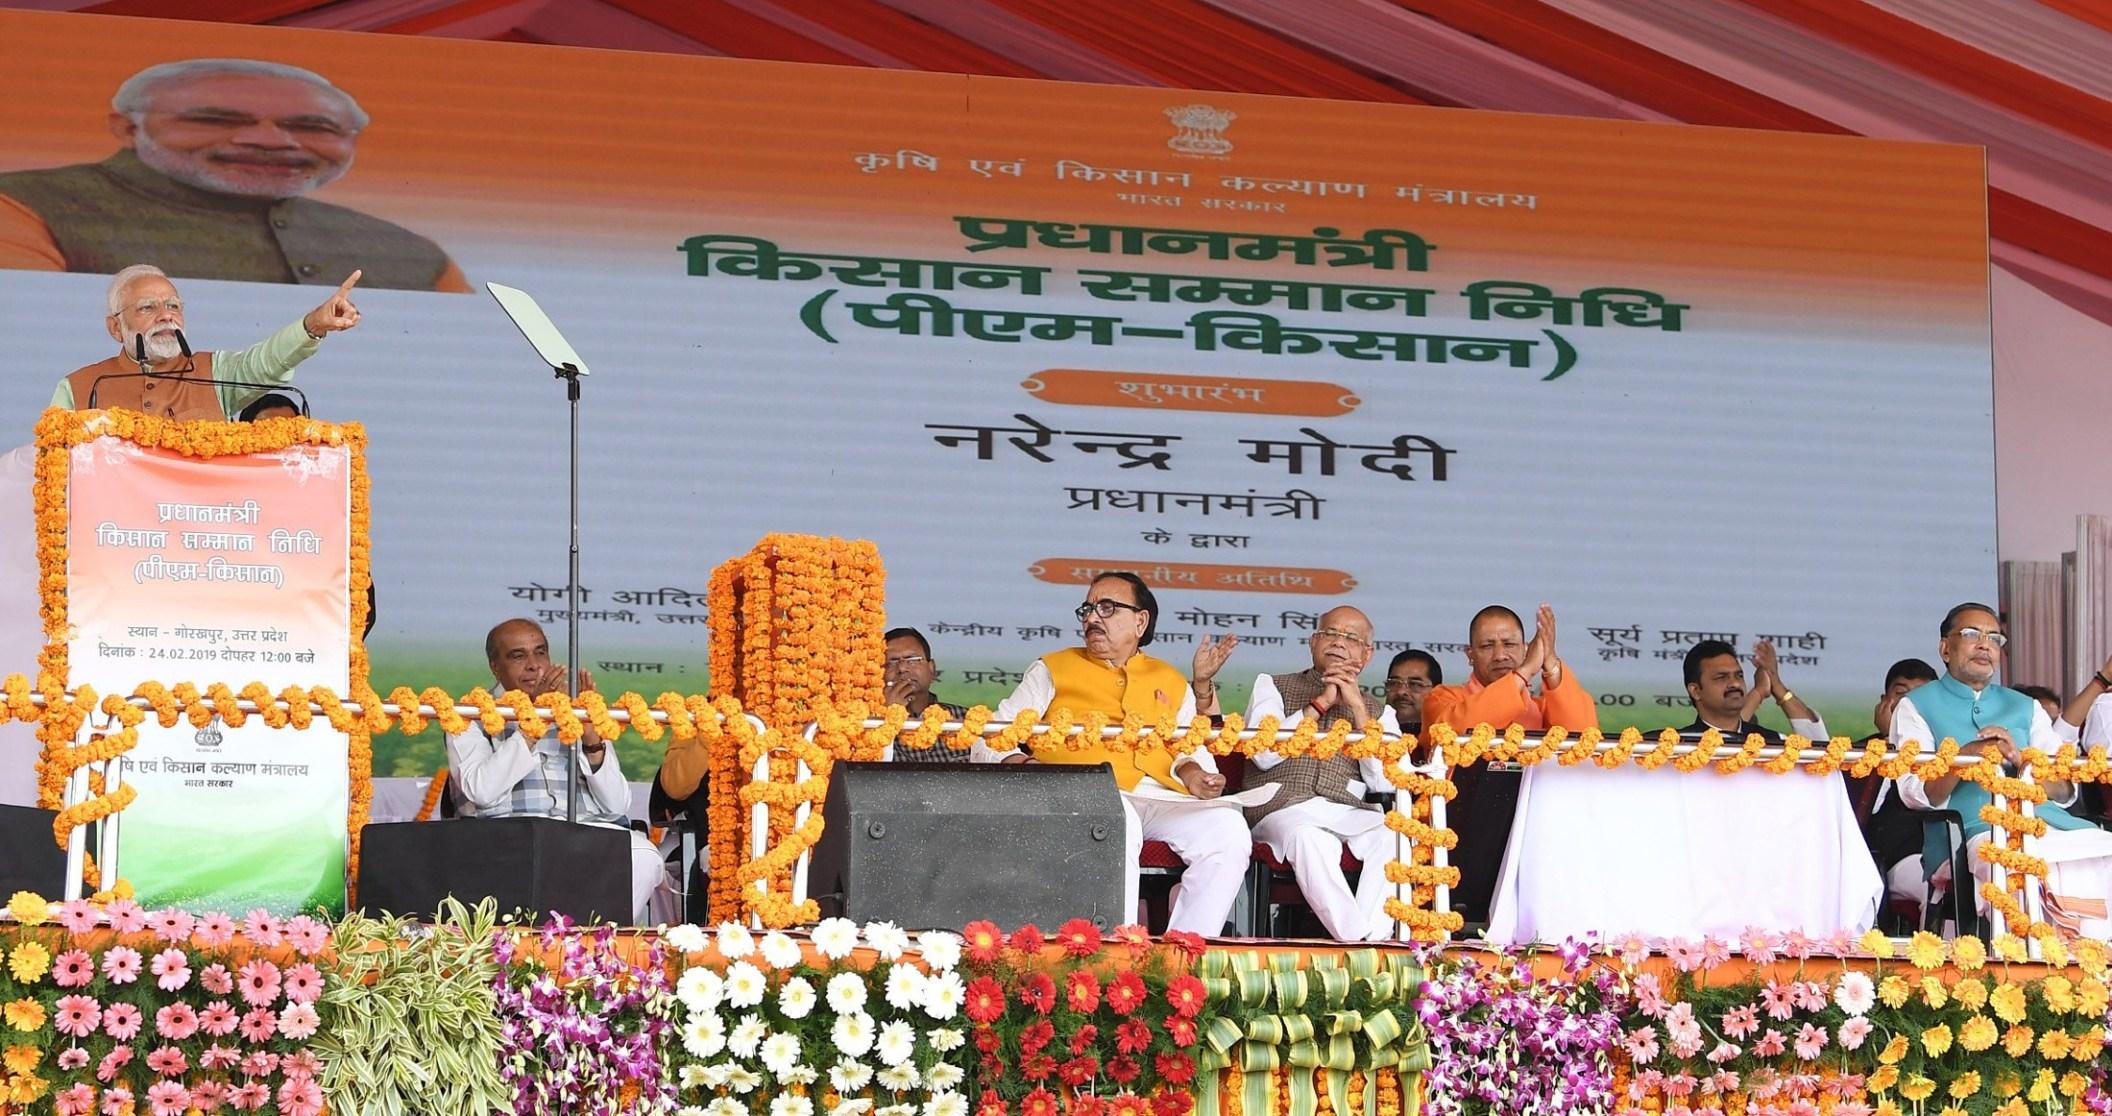 पंतप्रधान किसान योजनेंतर्गत जमा पैसे लंपास